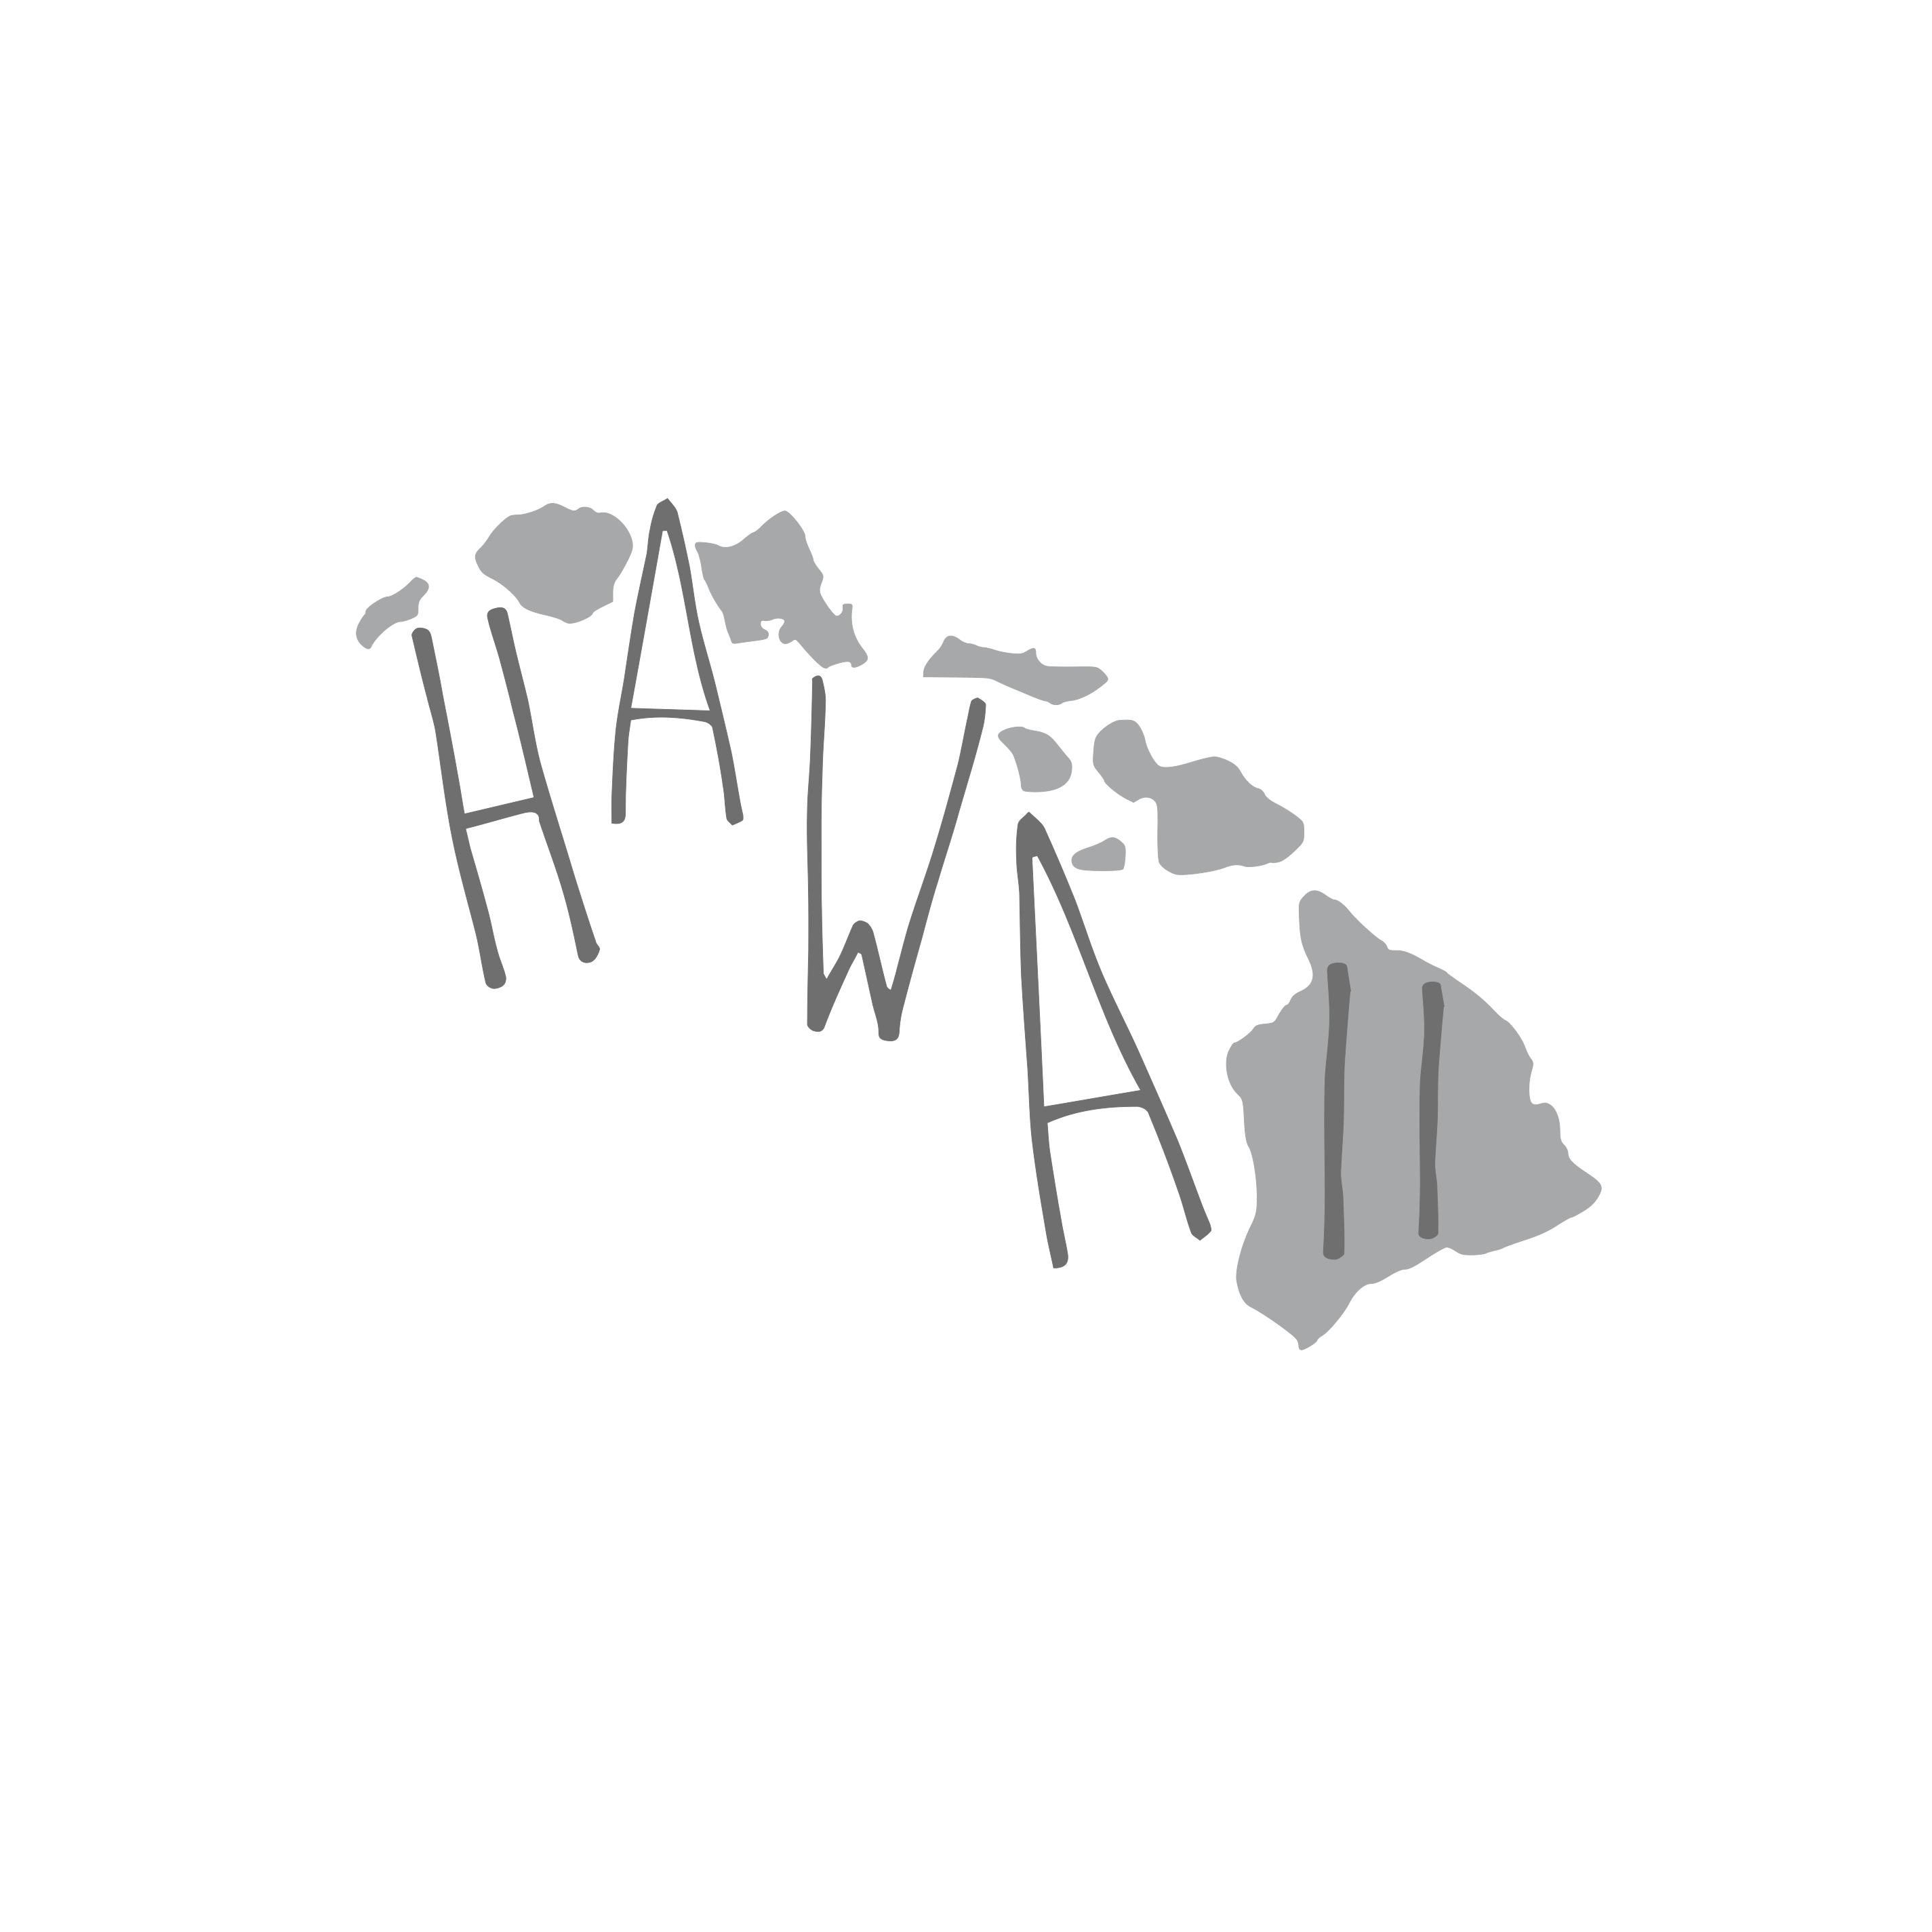 8101 Hawaii State w/ Words